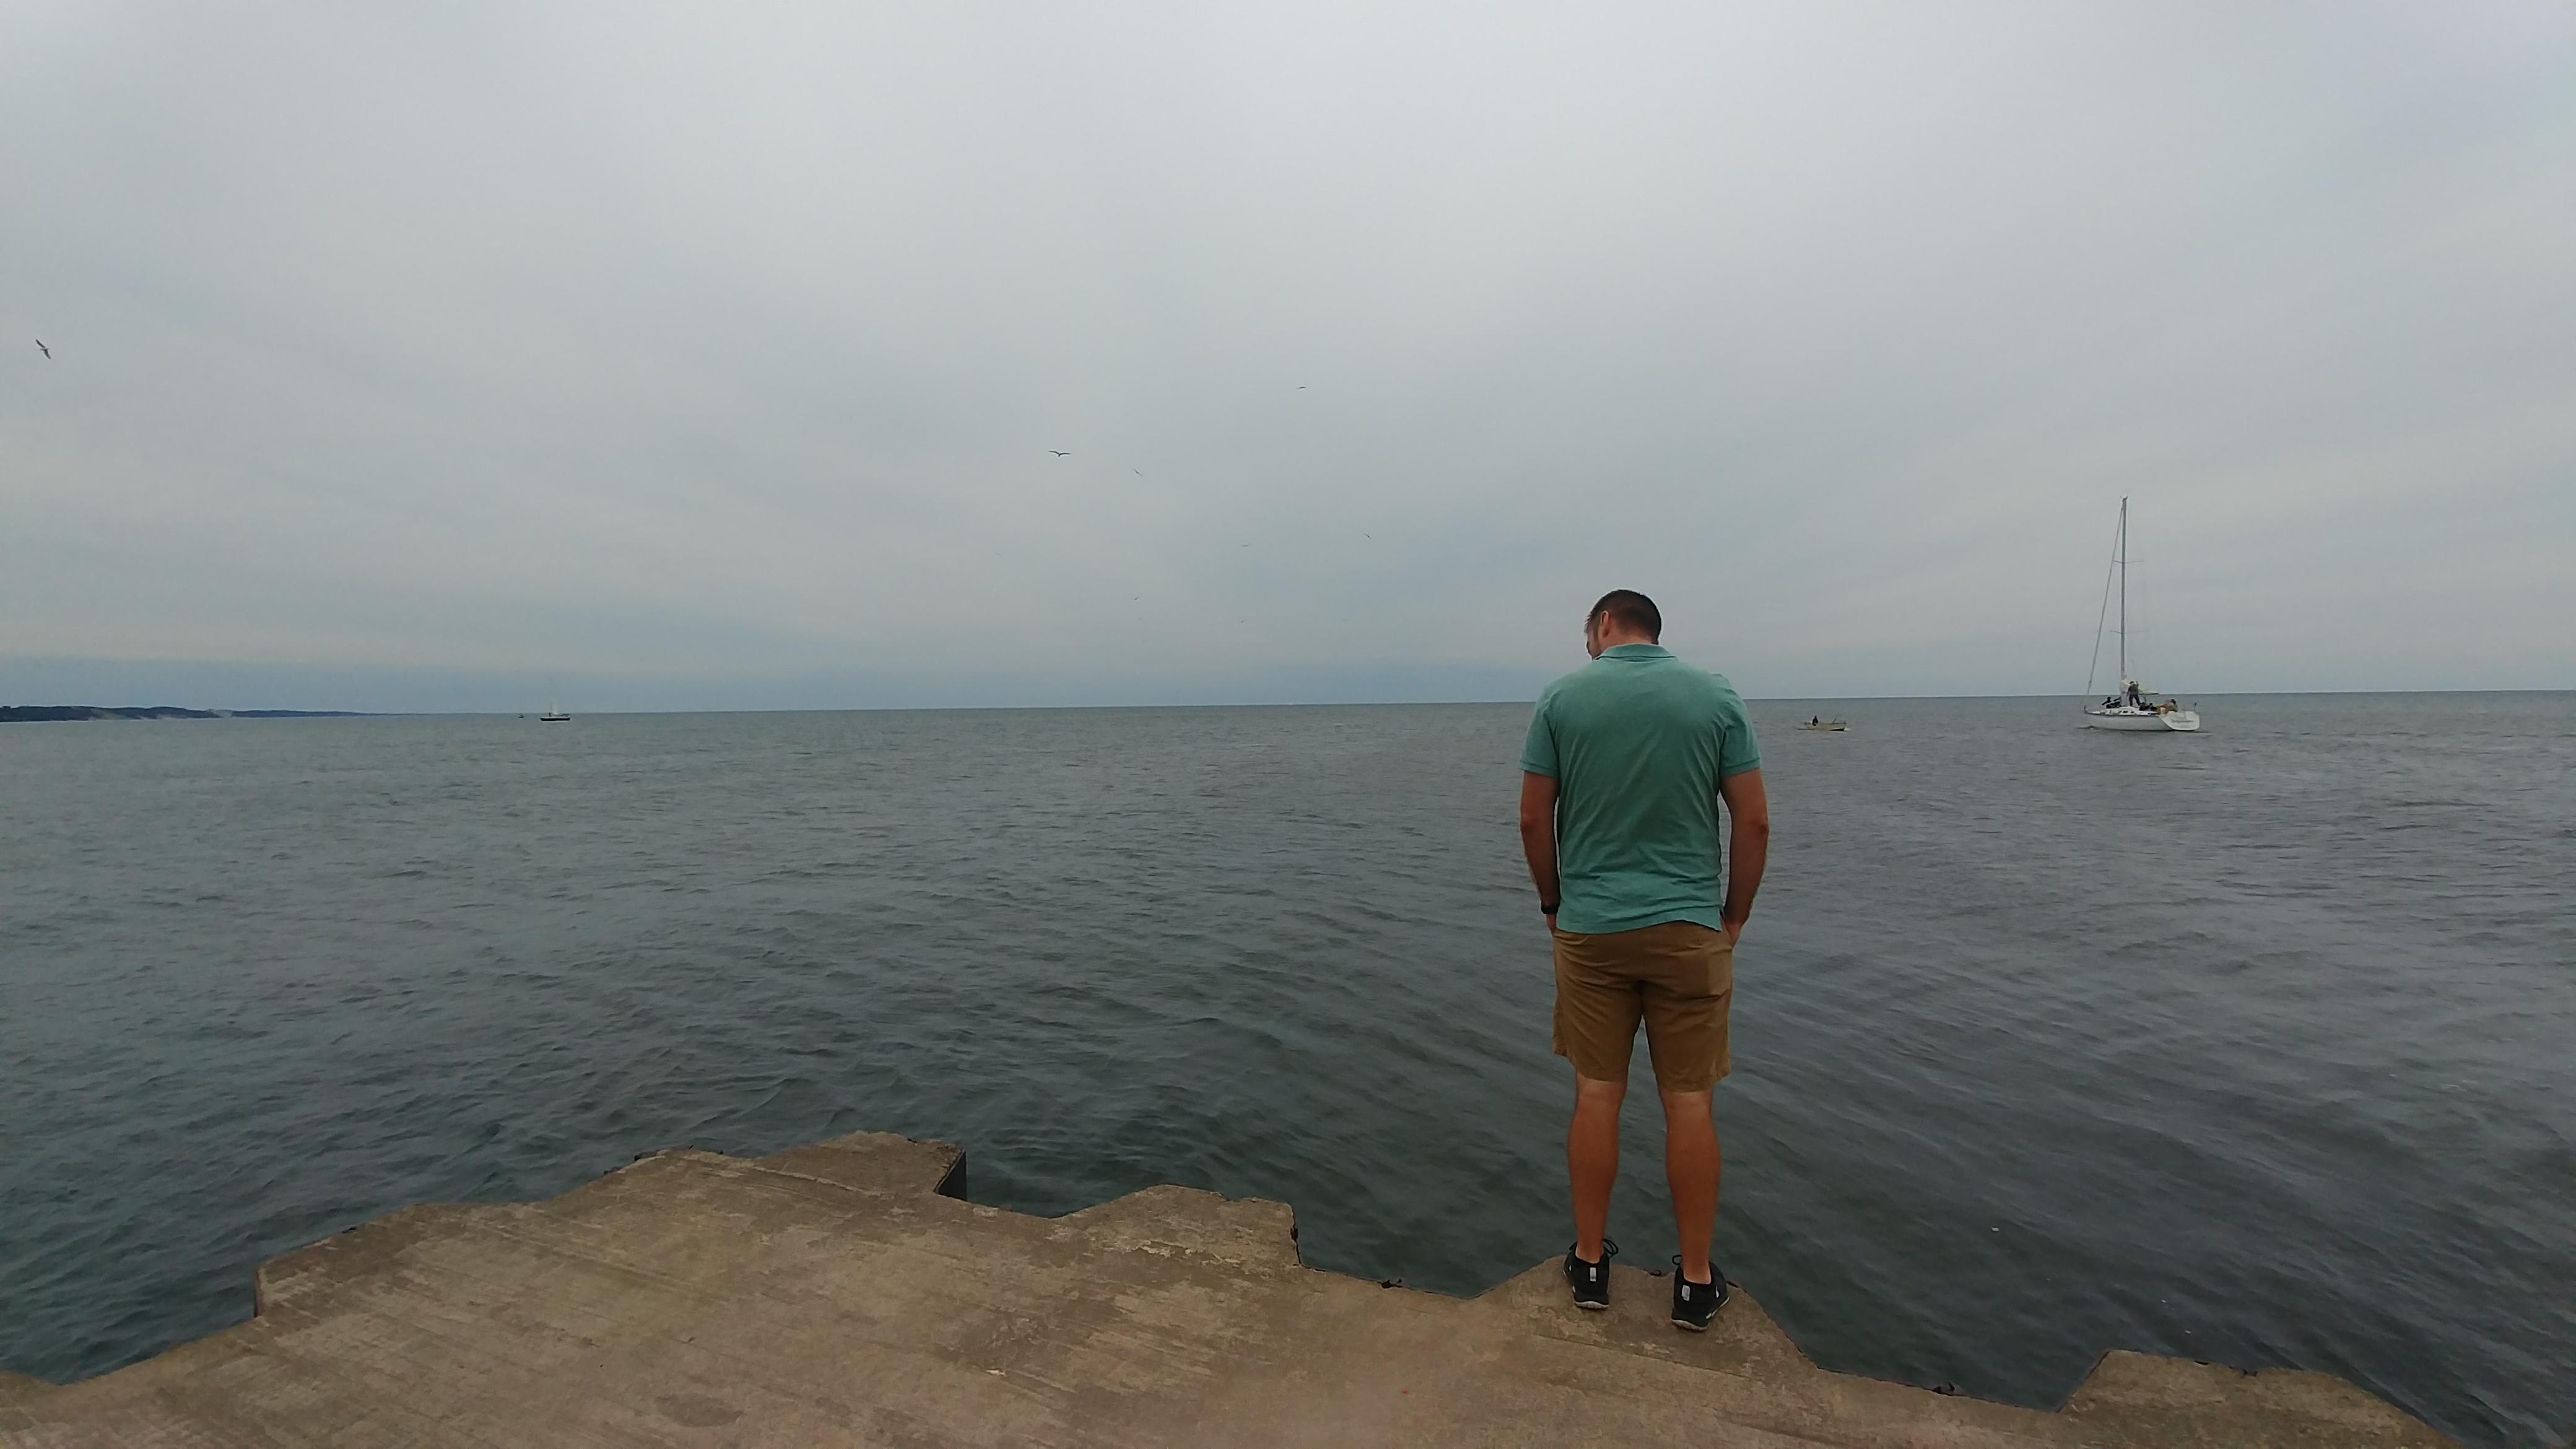 J on edge of pier